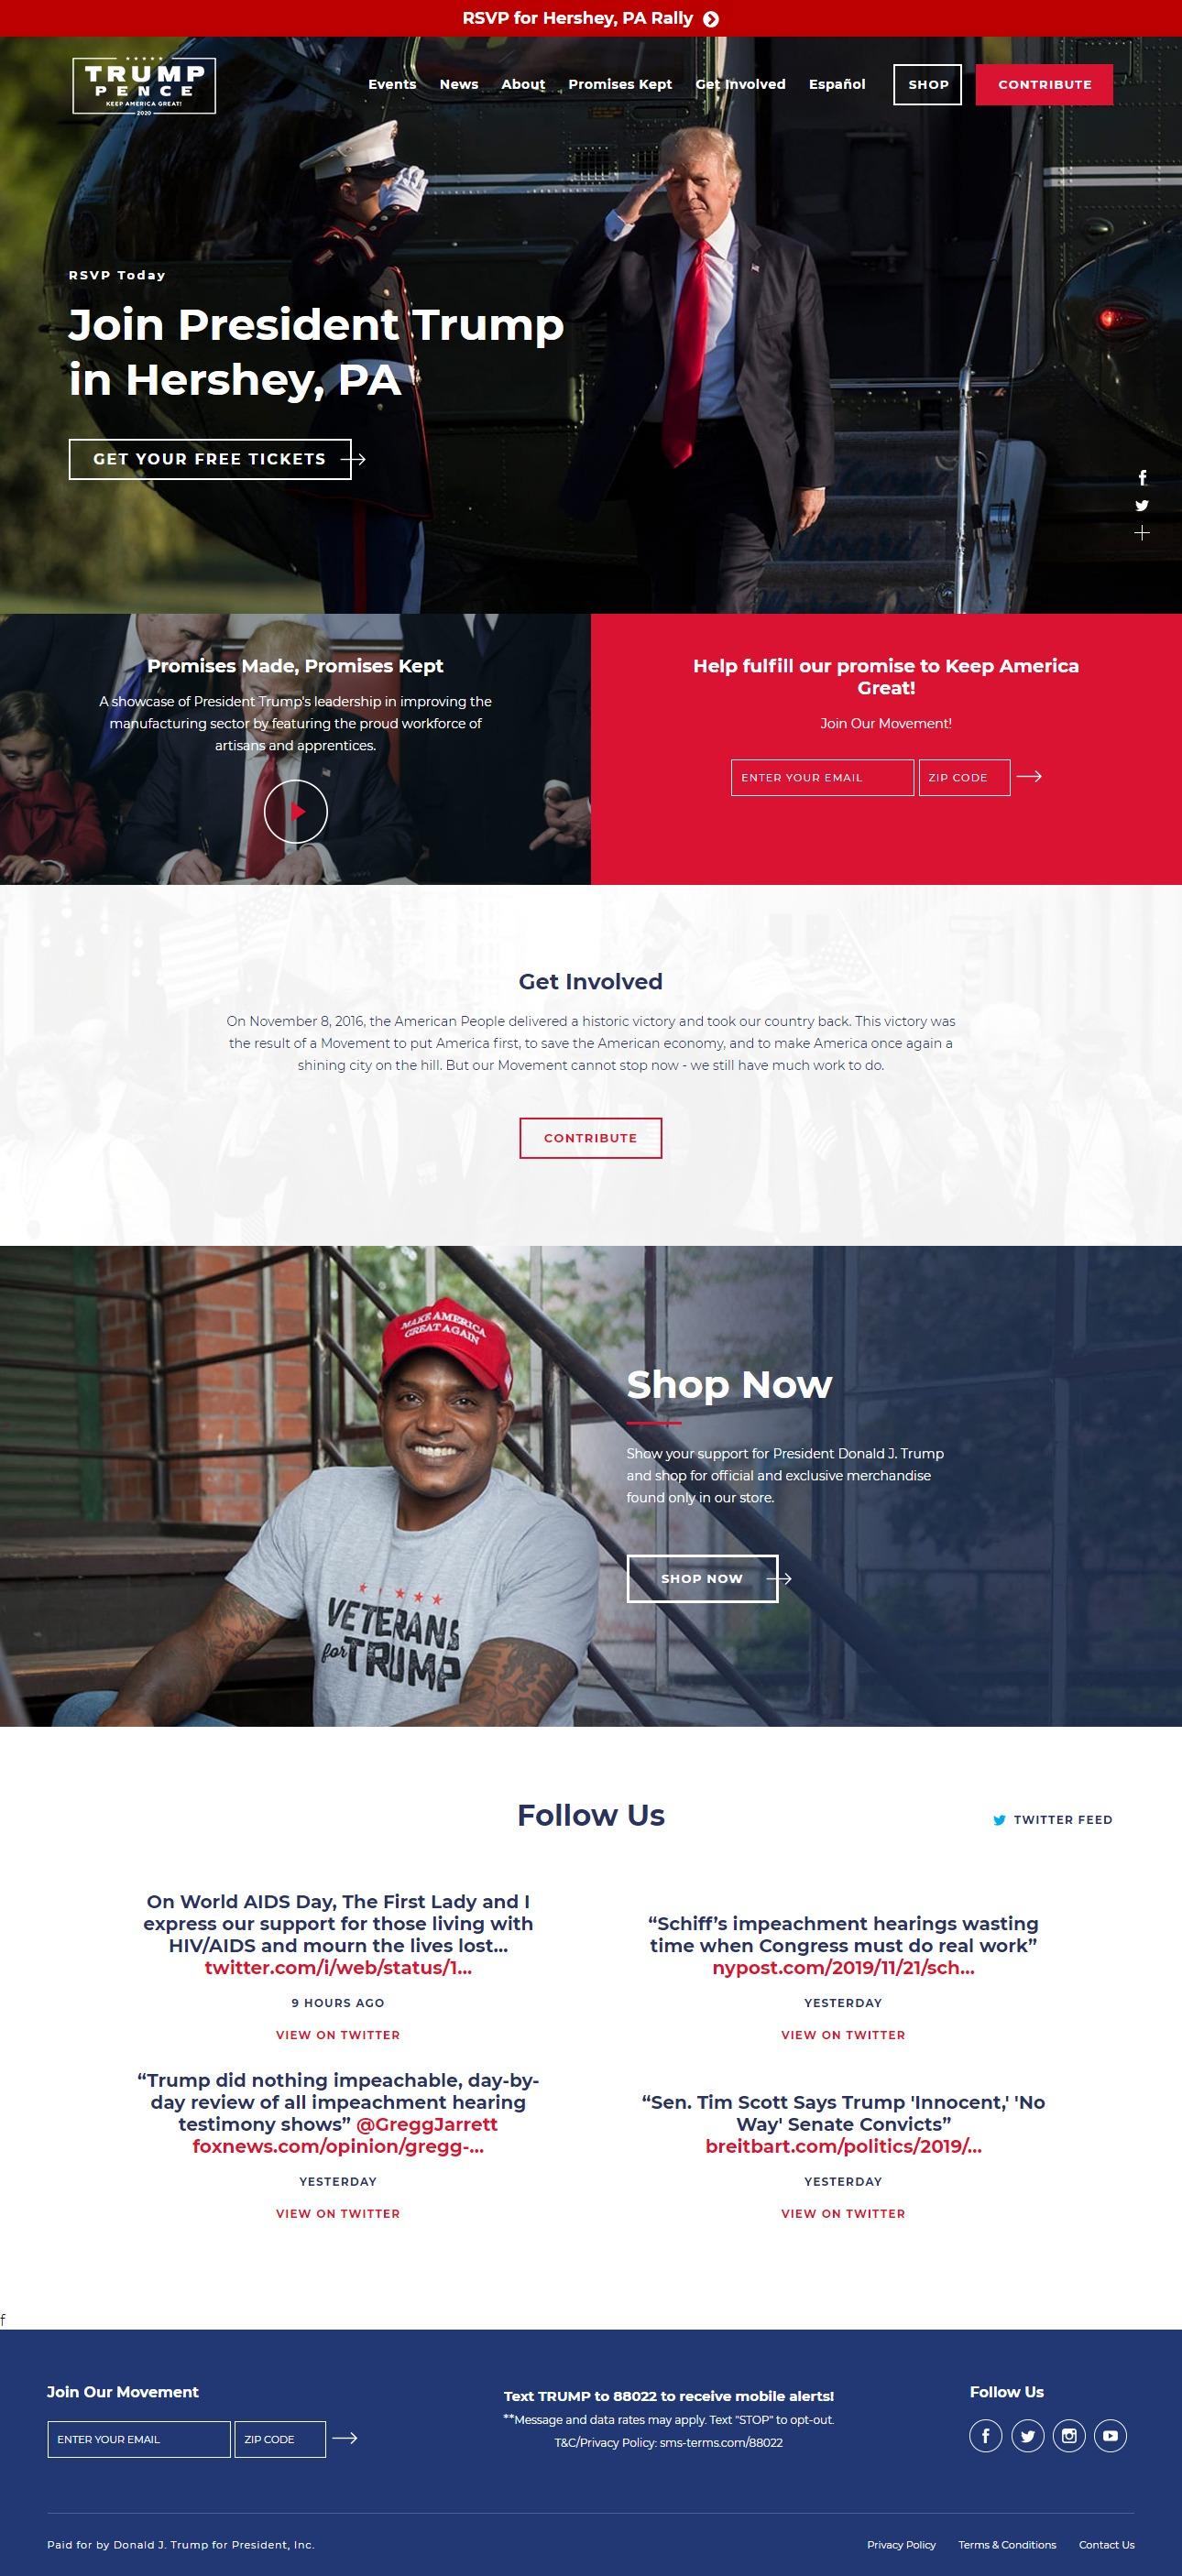 Homepage Snapshot for December 1, 2019: President Donald J. Trump